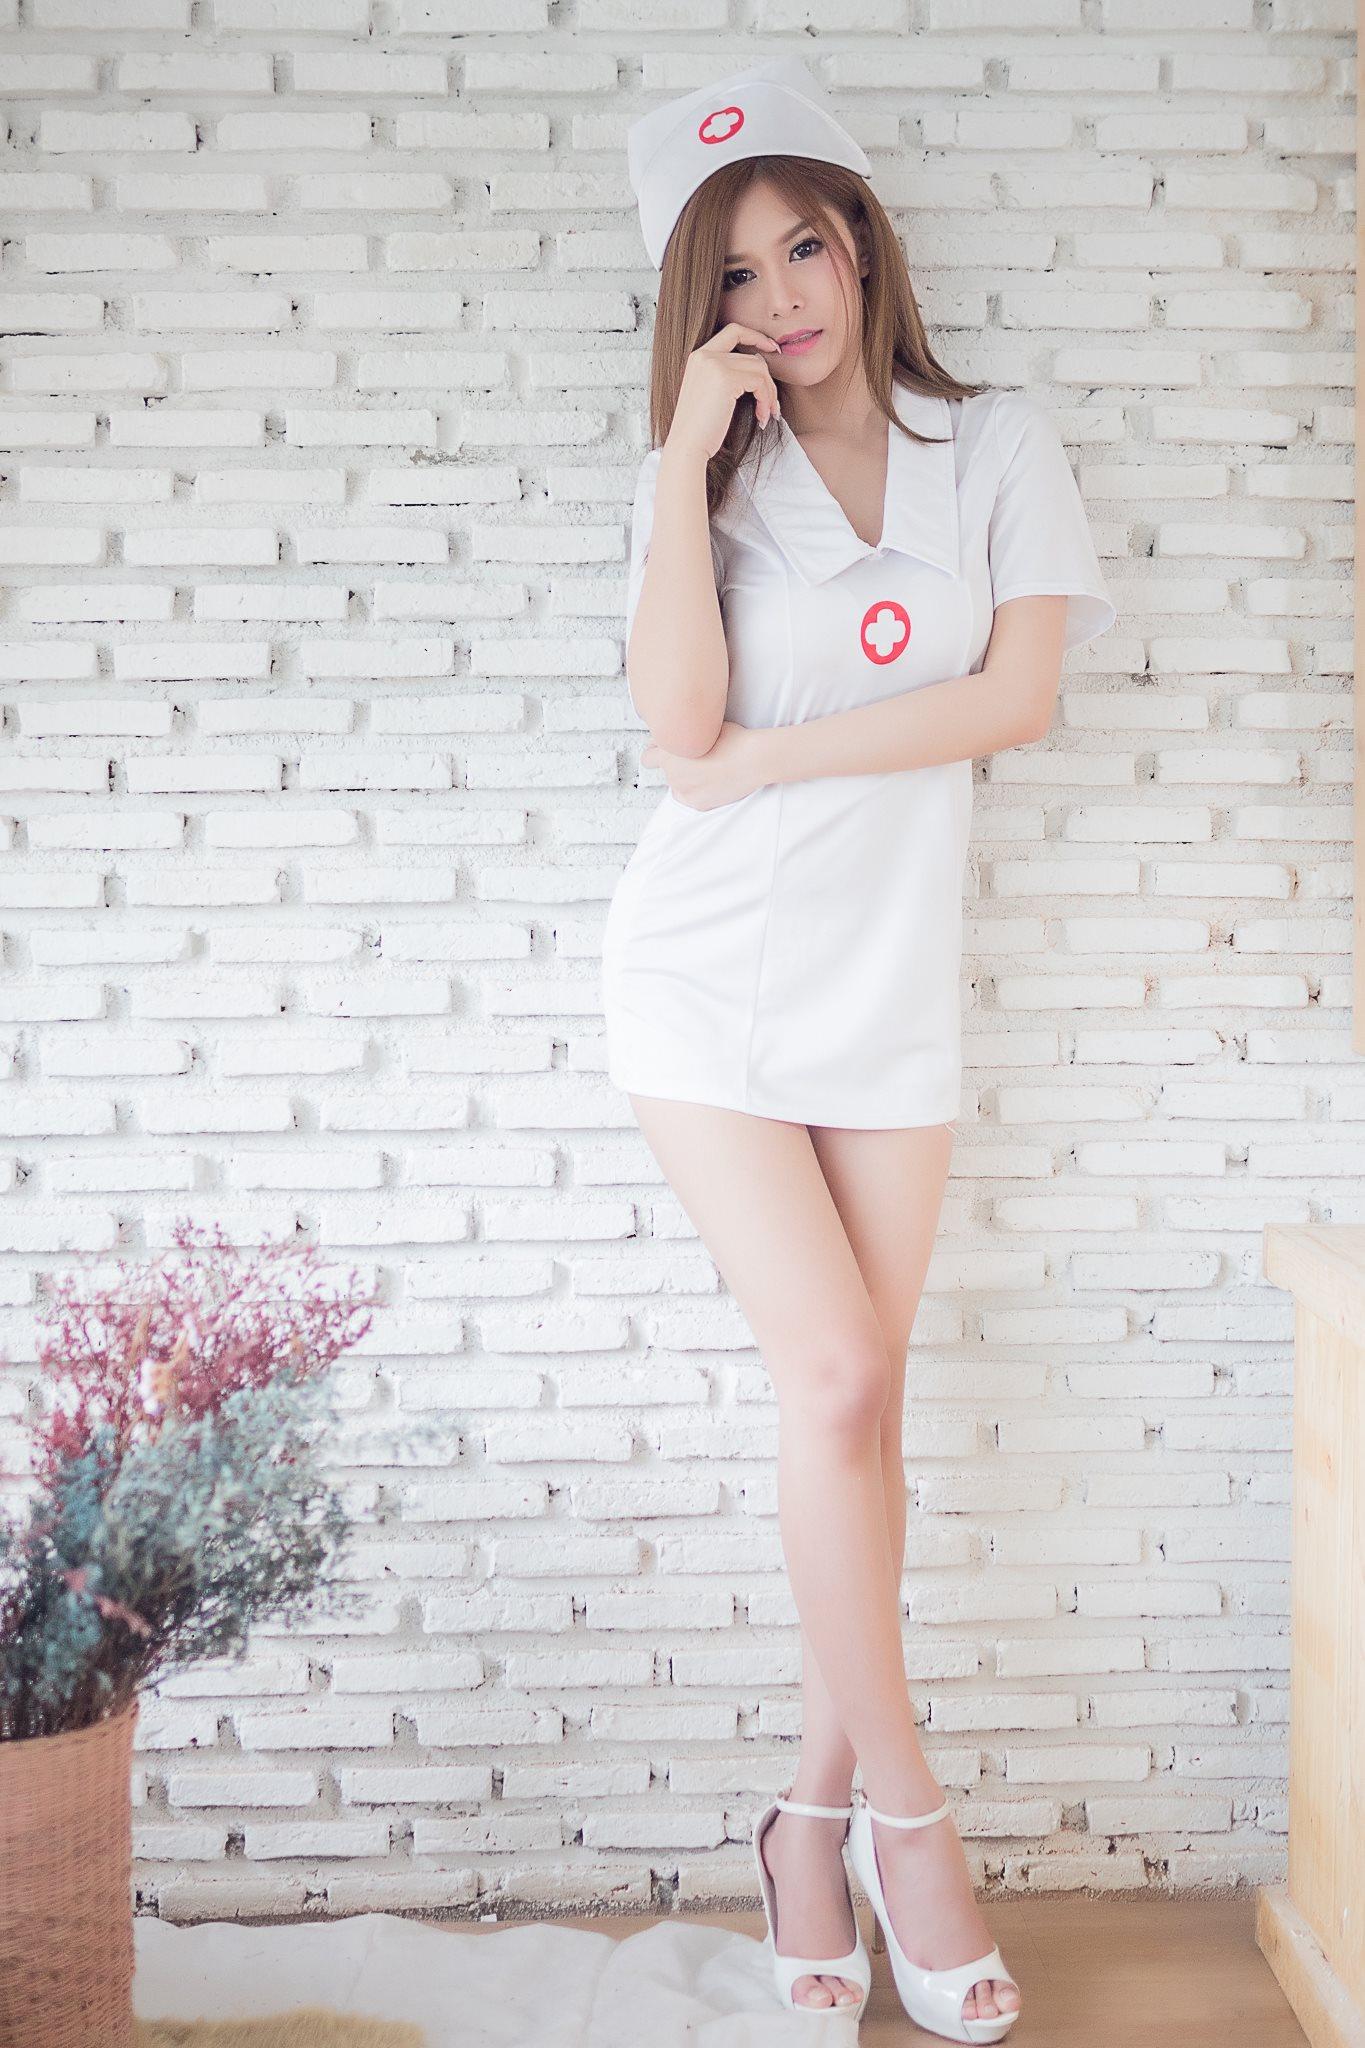 I Need a Doctor - Kanyakarn Kaewnisai